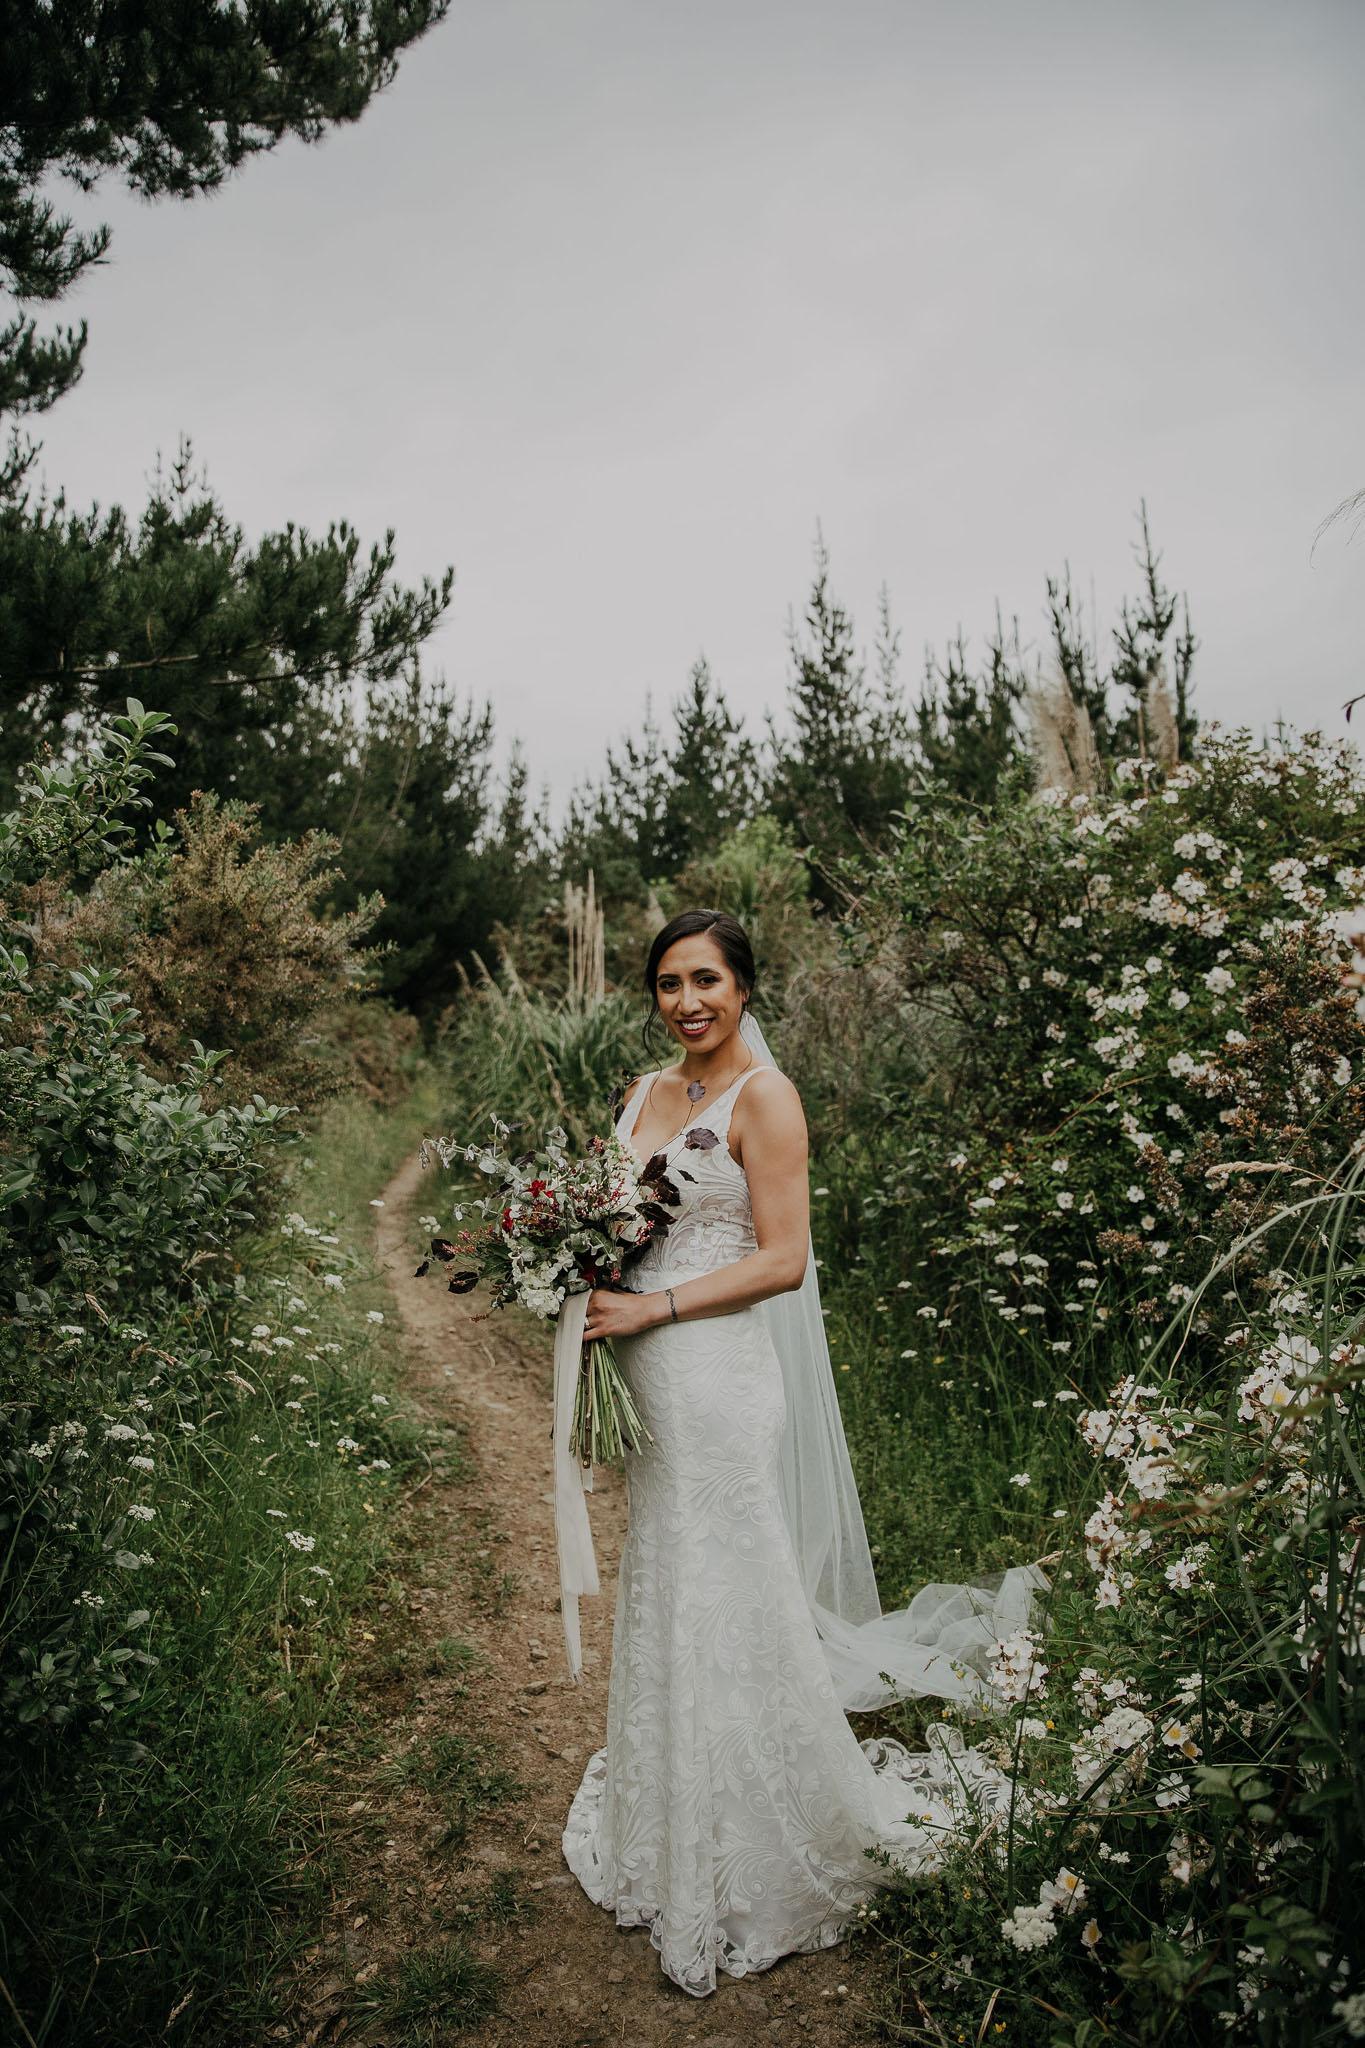 Elyssa Taulapiu Hera Bosset Gown Green And White Outdoors